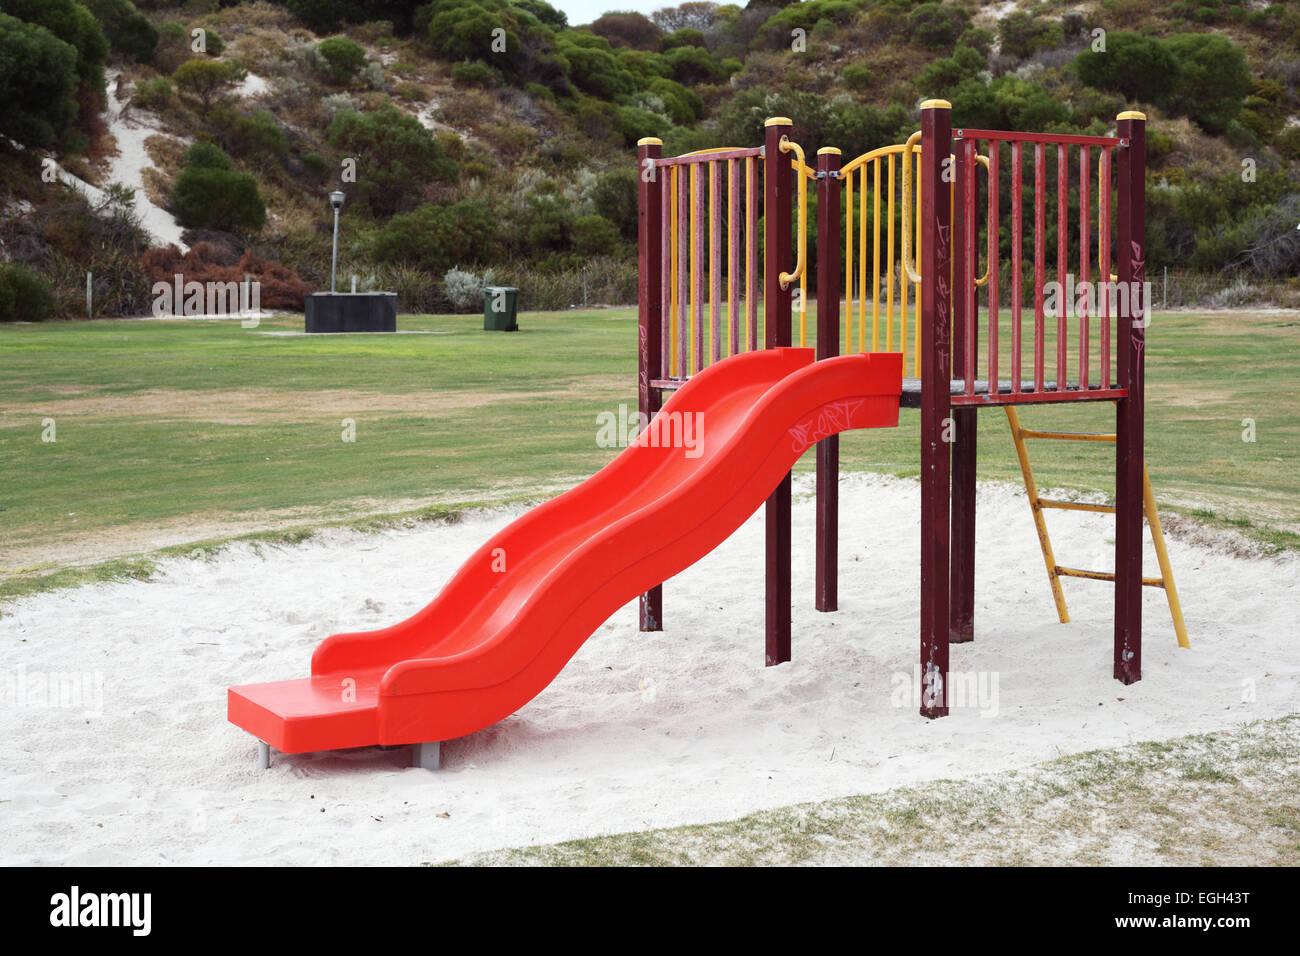 Children's playground equipment comprising a slide, walking bridge and climbing pole. - Stock Image